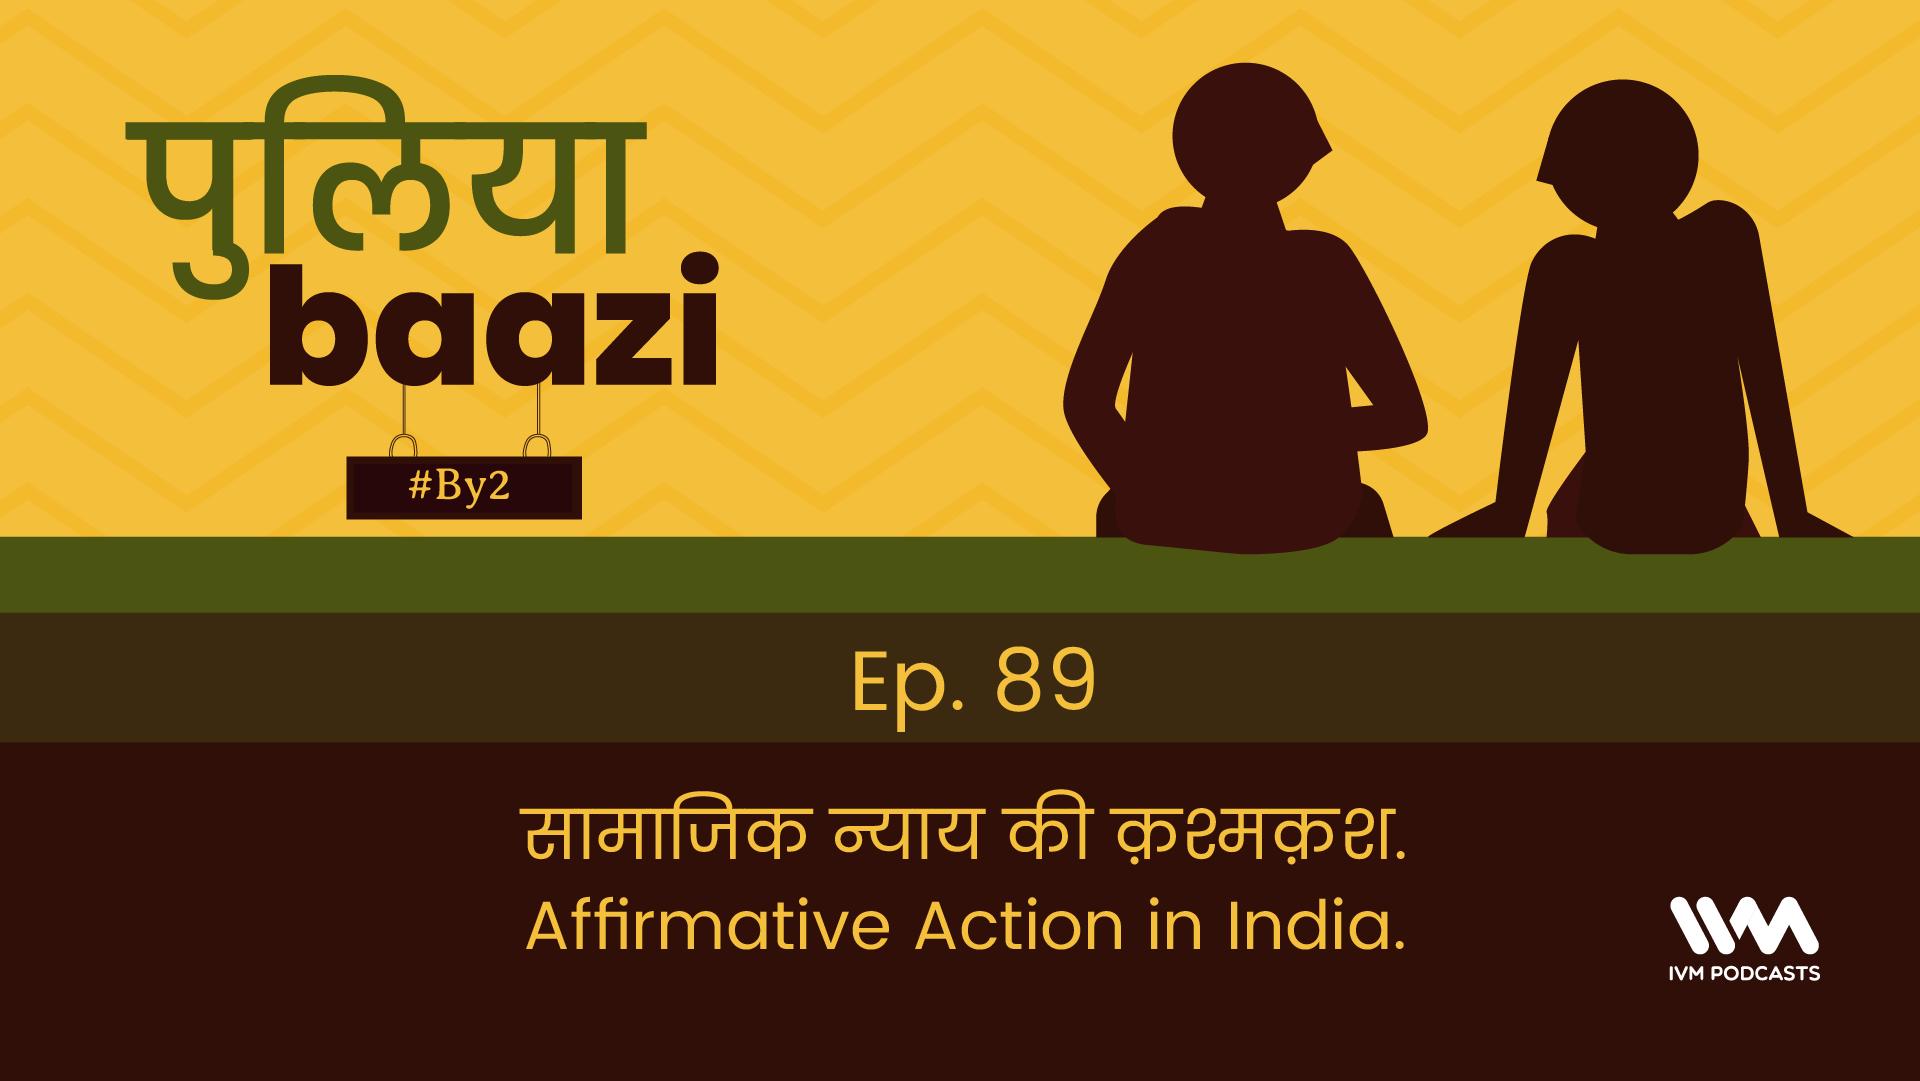 Ep. 89: सामाजिक न्याय की क़श्मक़श. Affirmative Action in India.